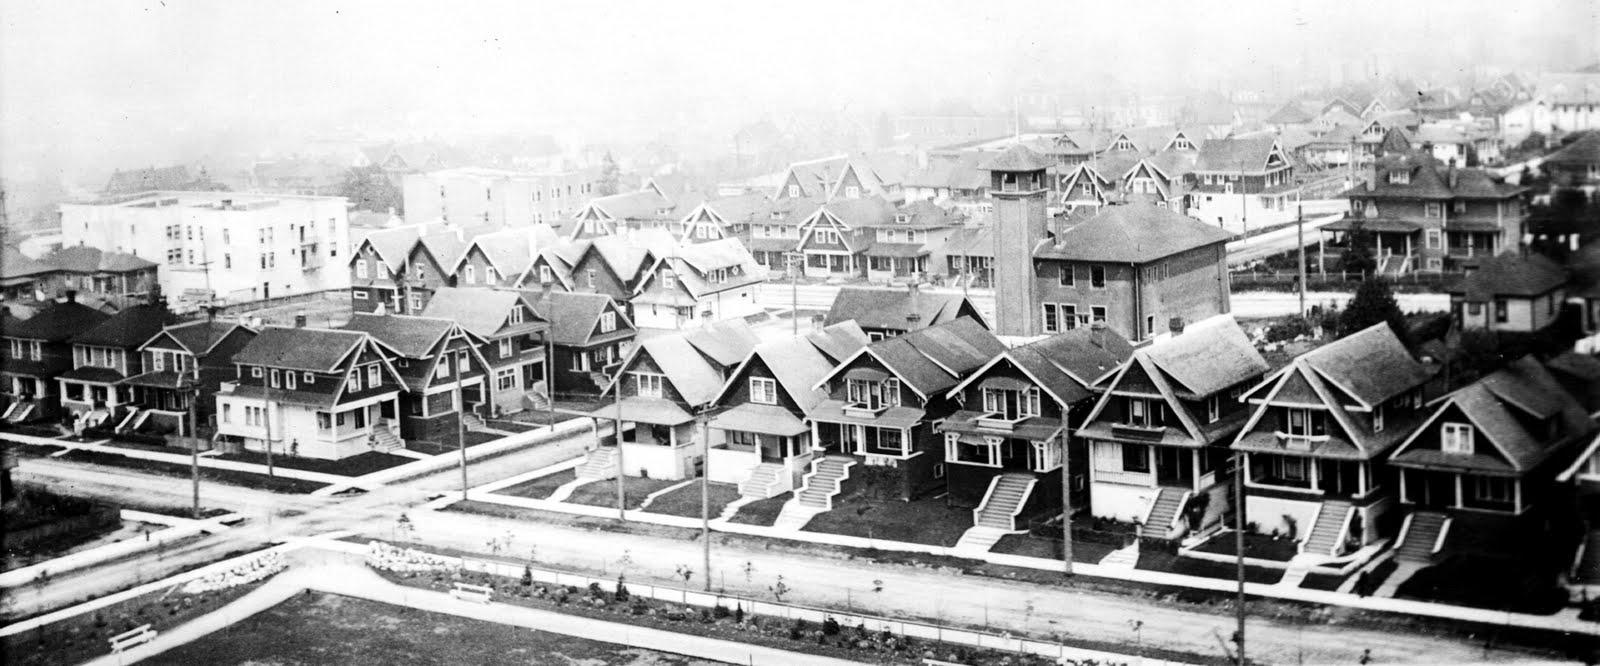 Kitchener | Grandview Heritage Group